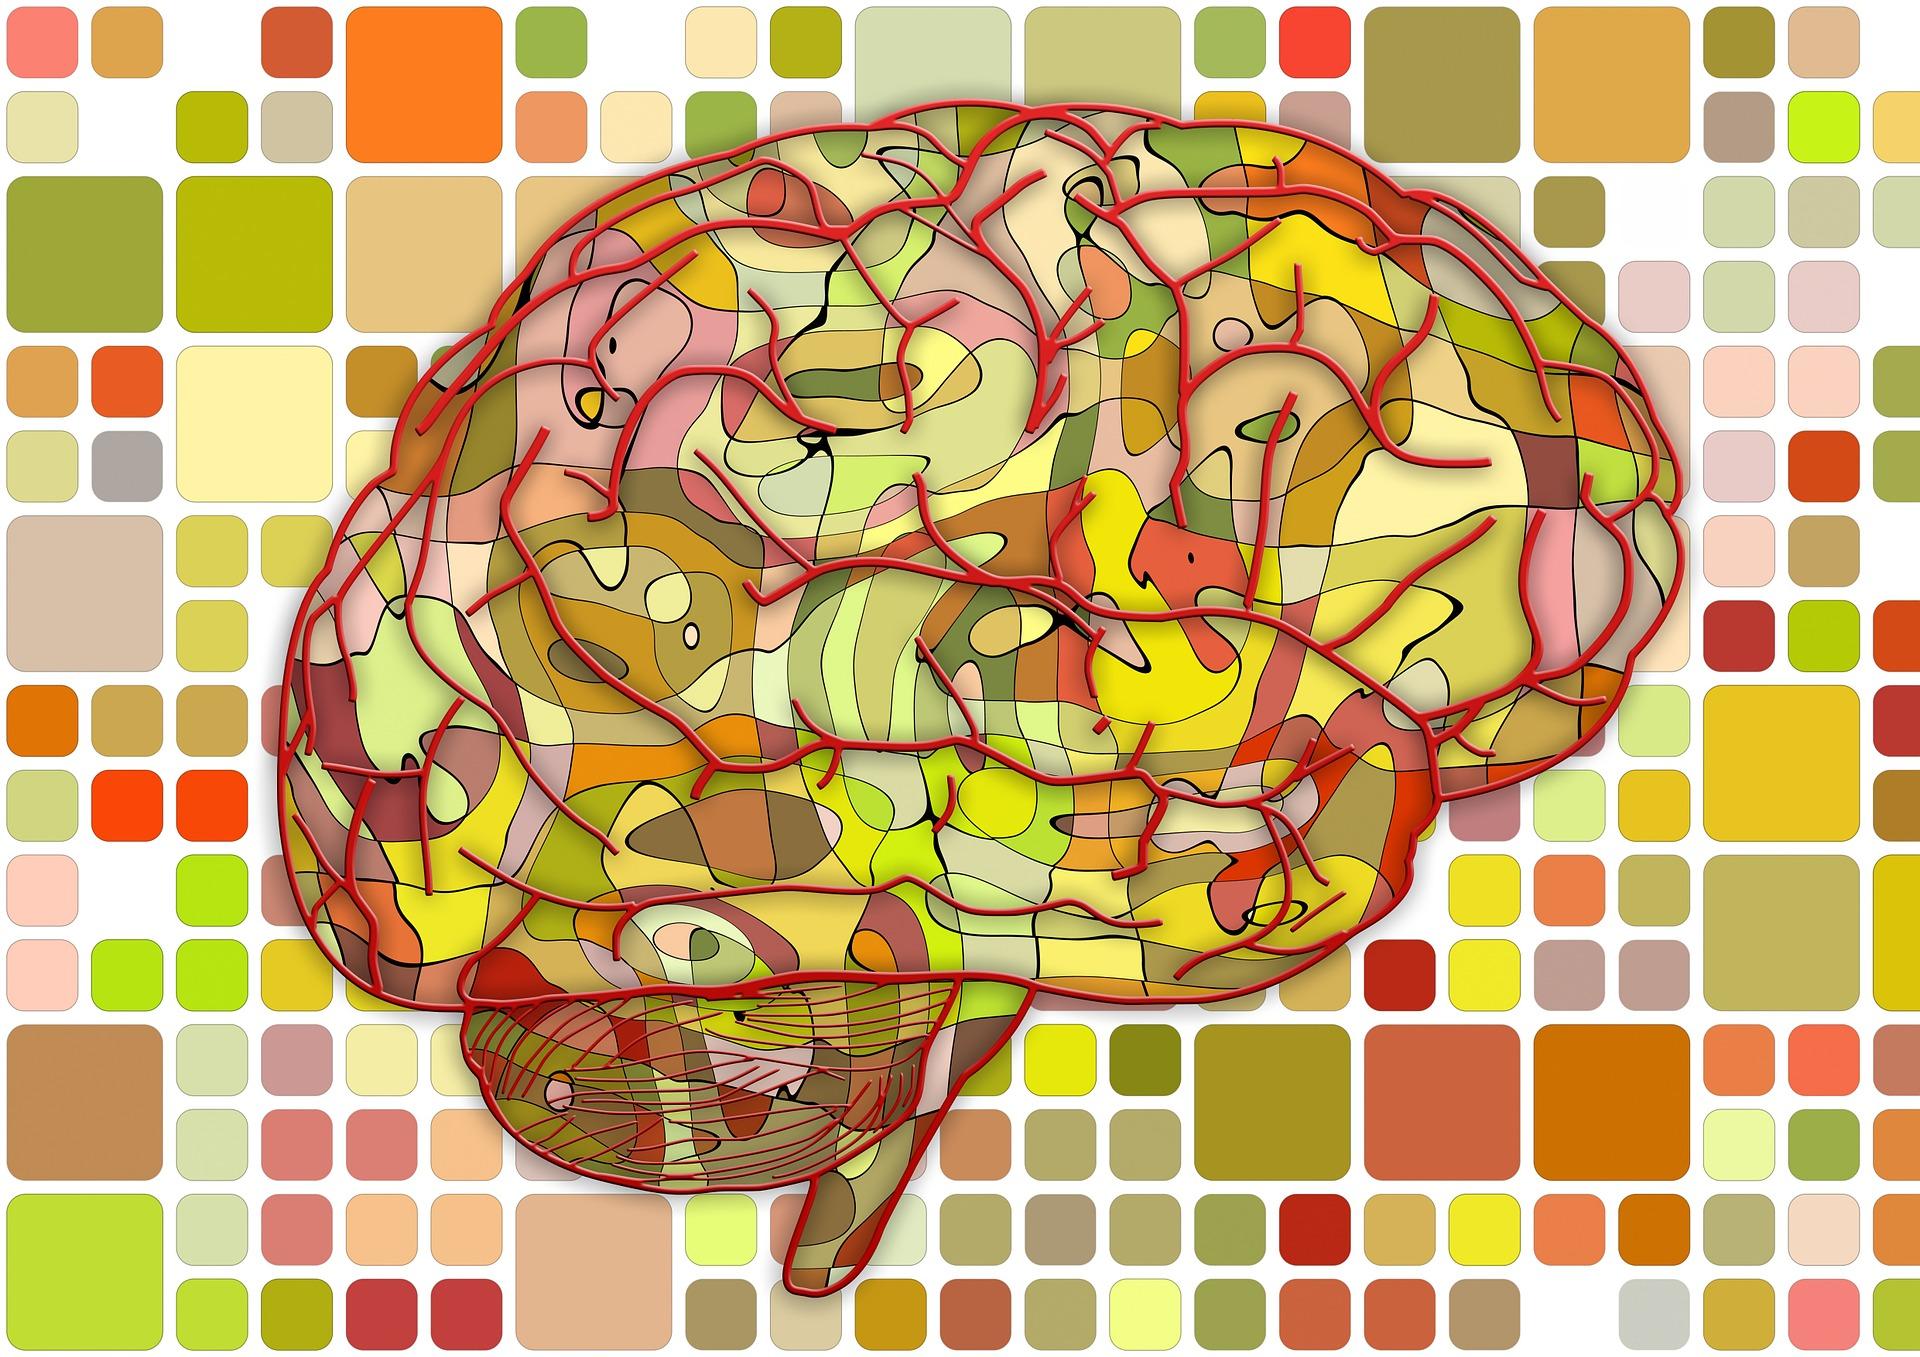 Mozak traži puno radno vreme   Mentalno aktivni   blog   NLP   CARS